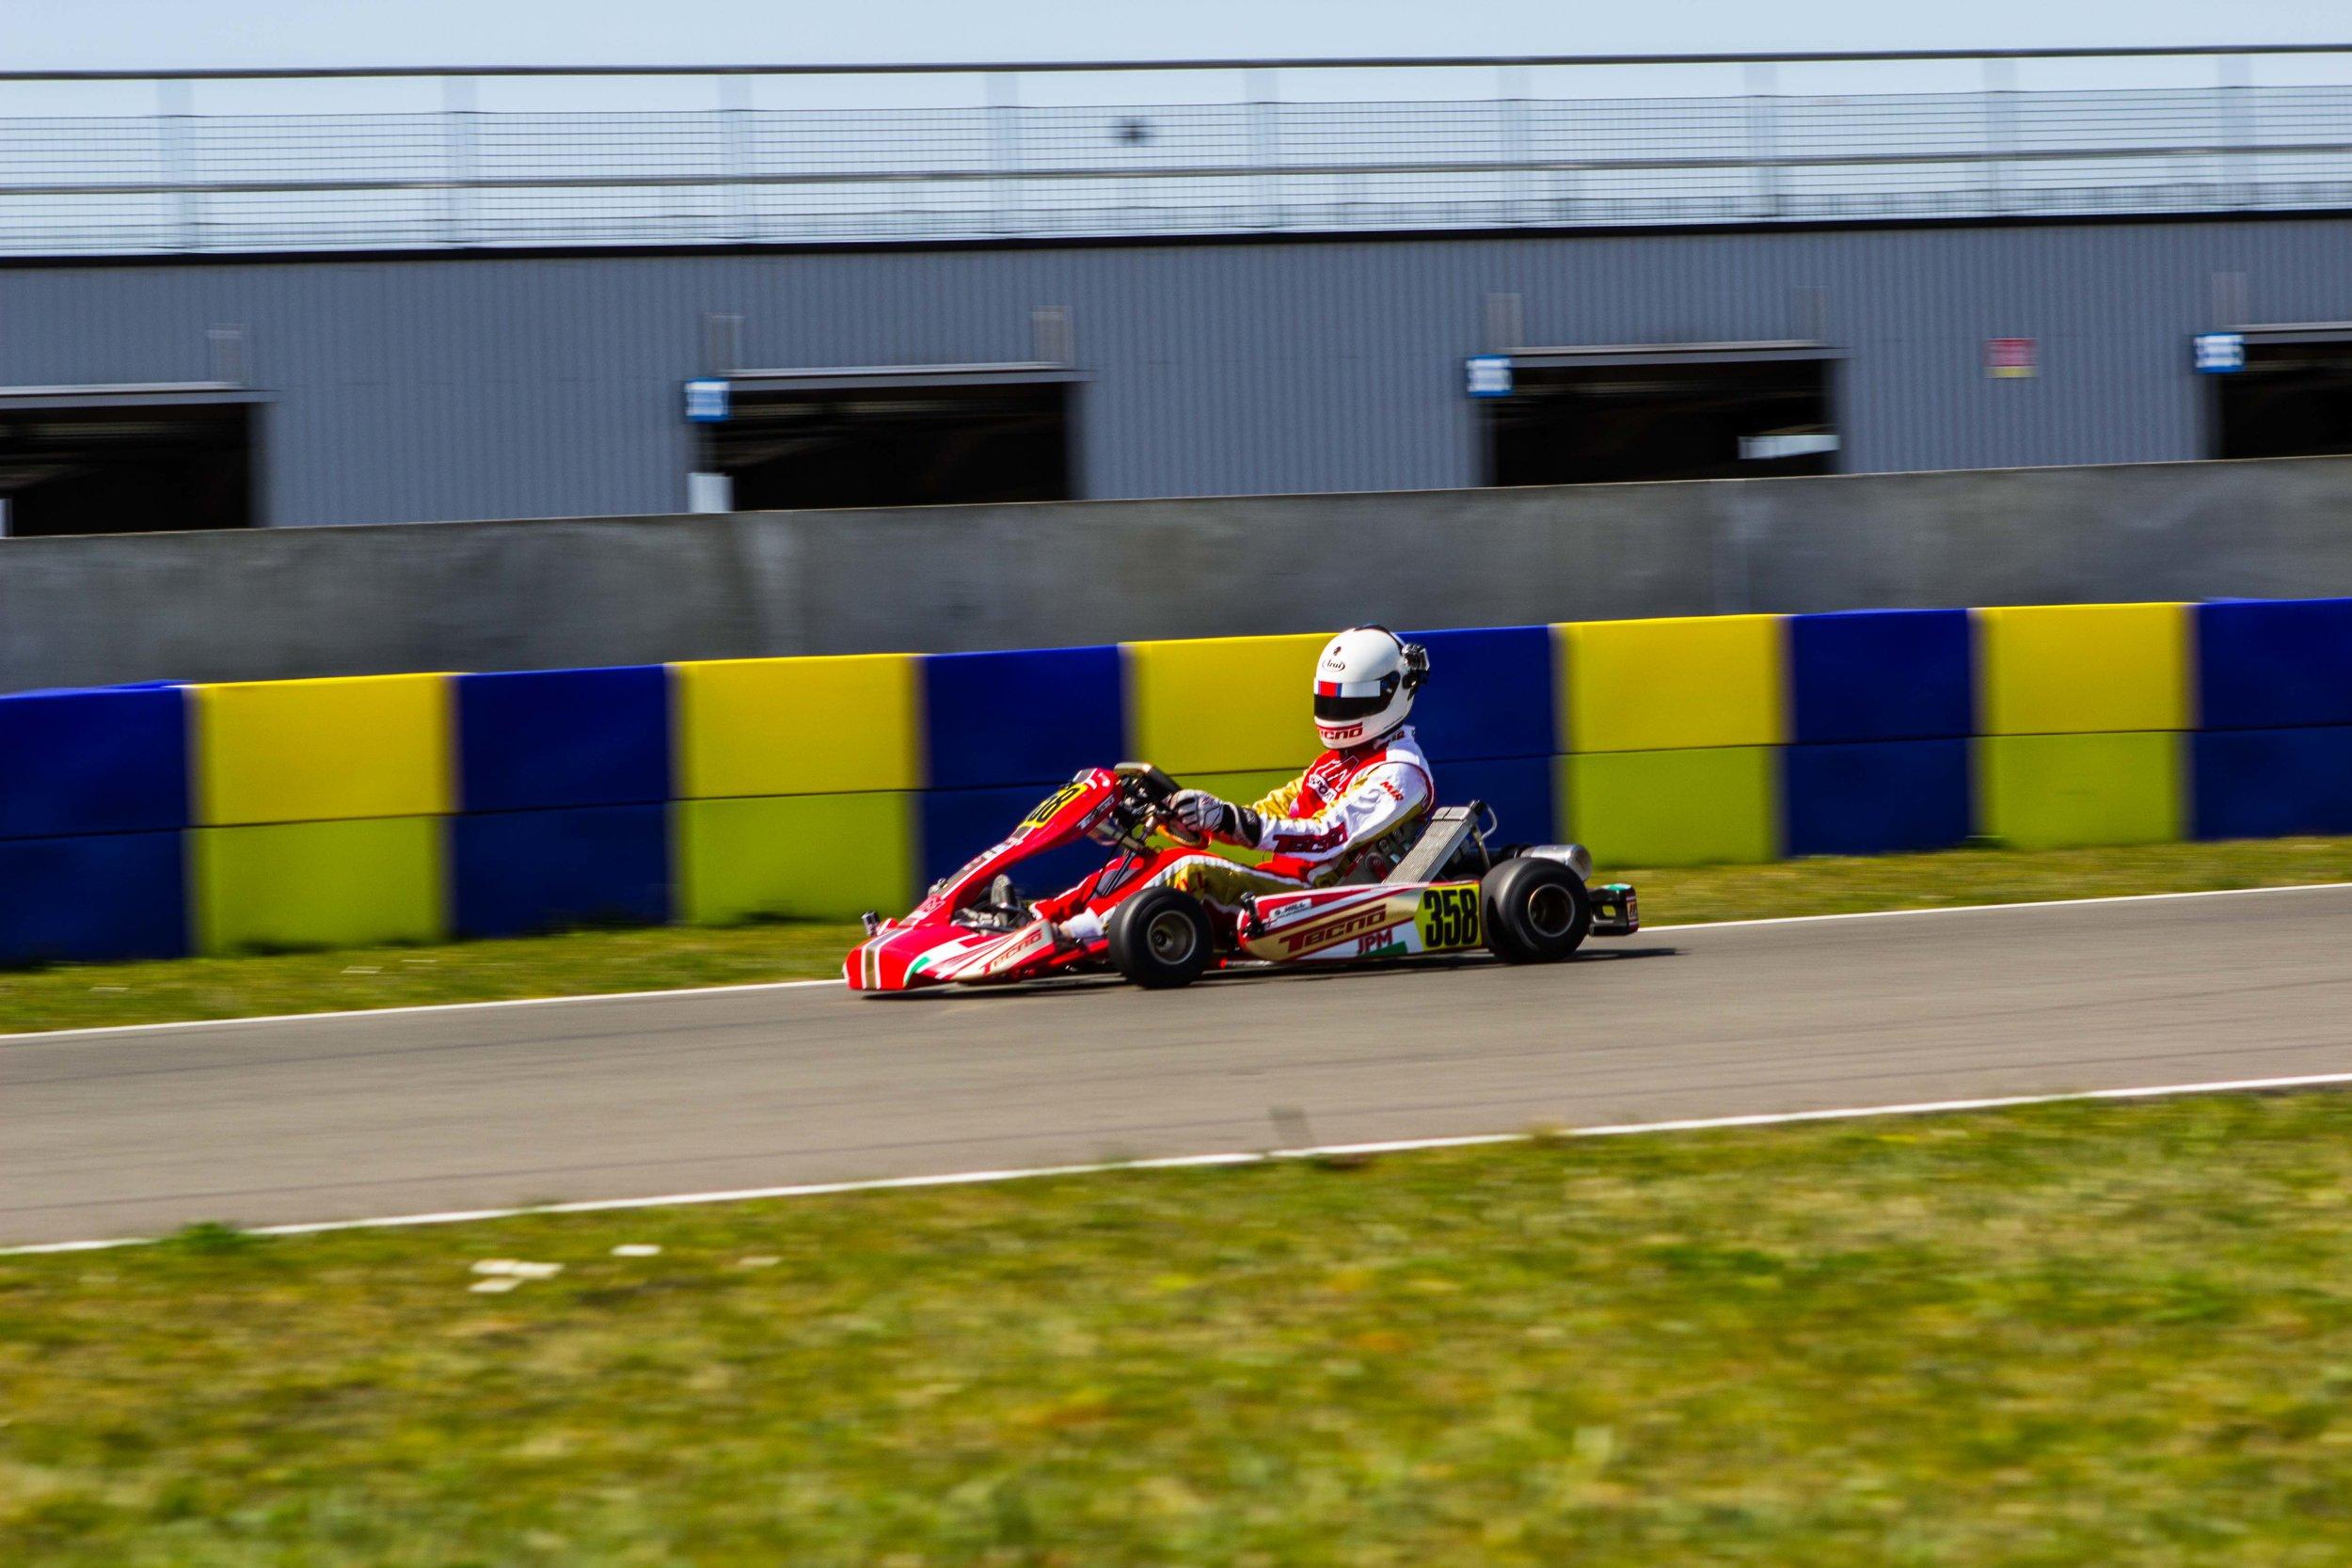 Drone go kart racing